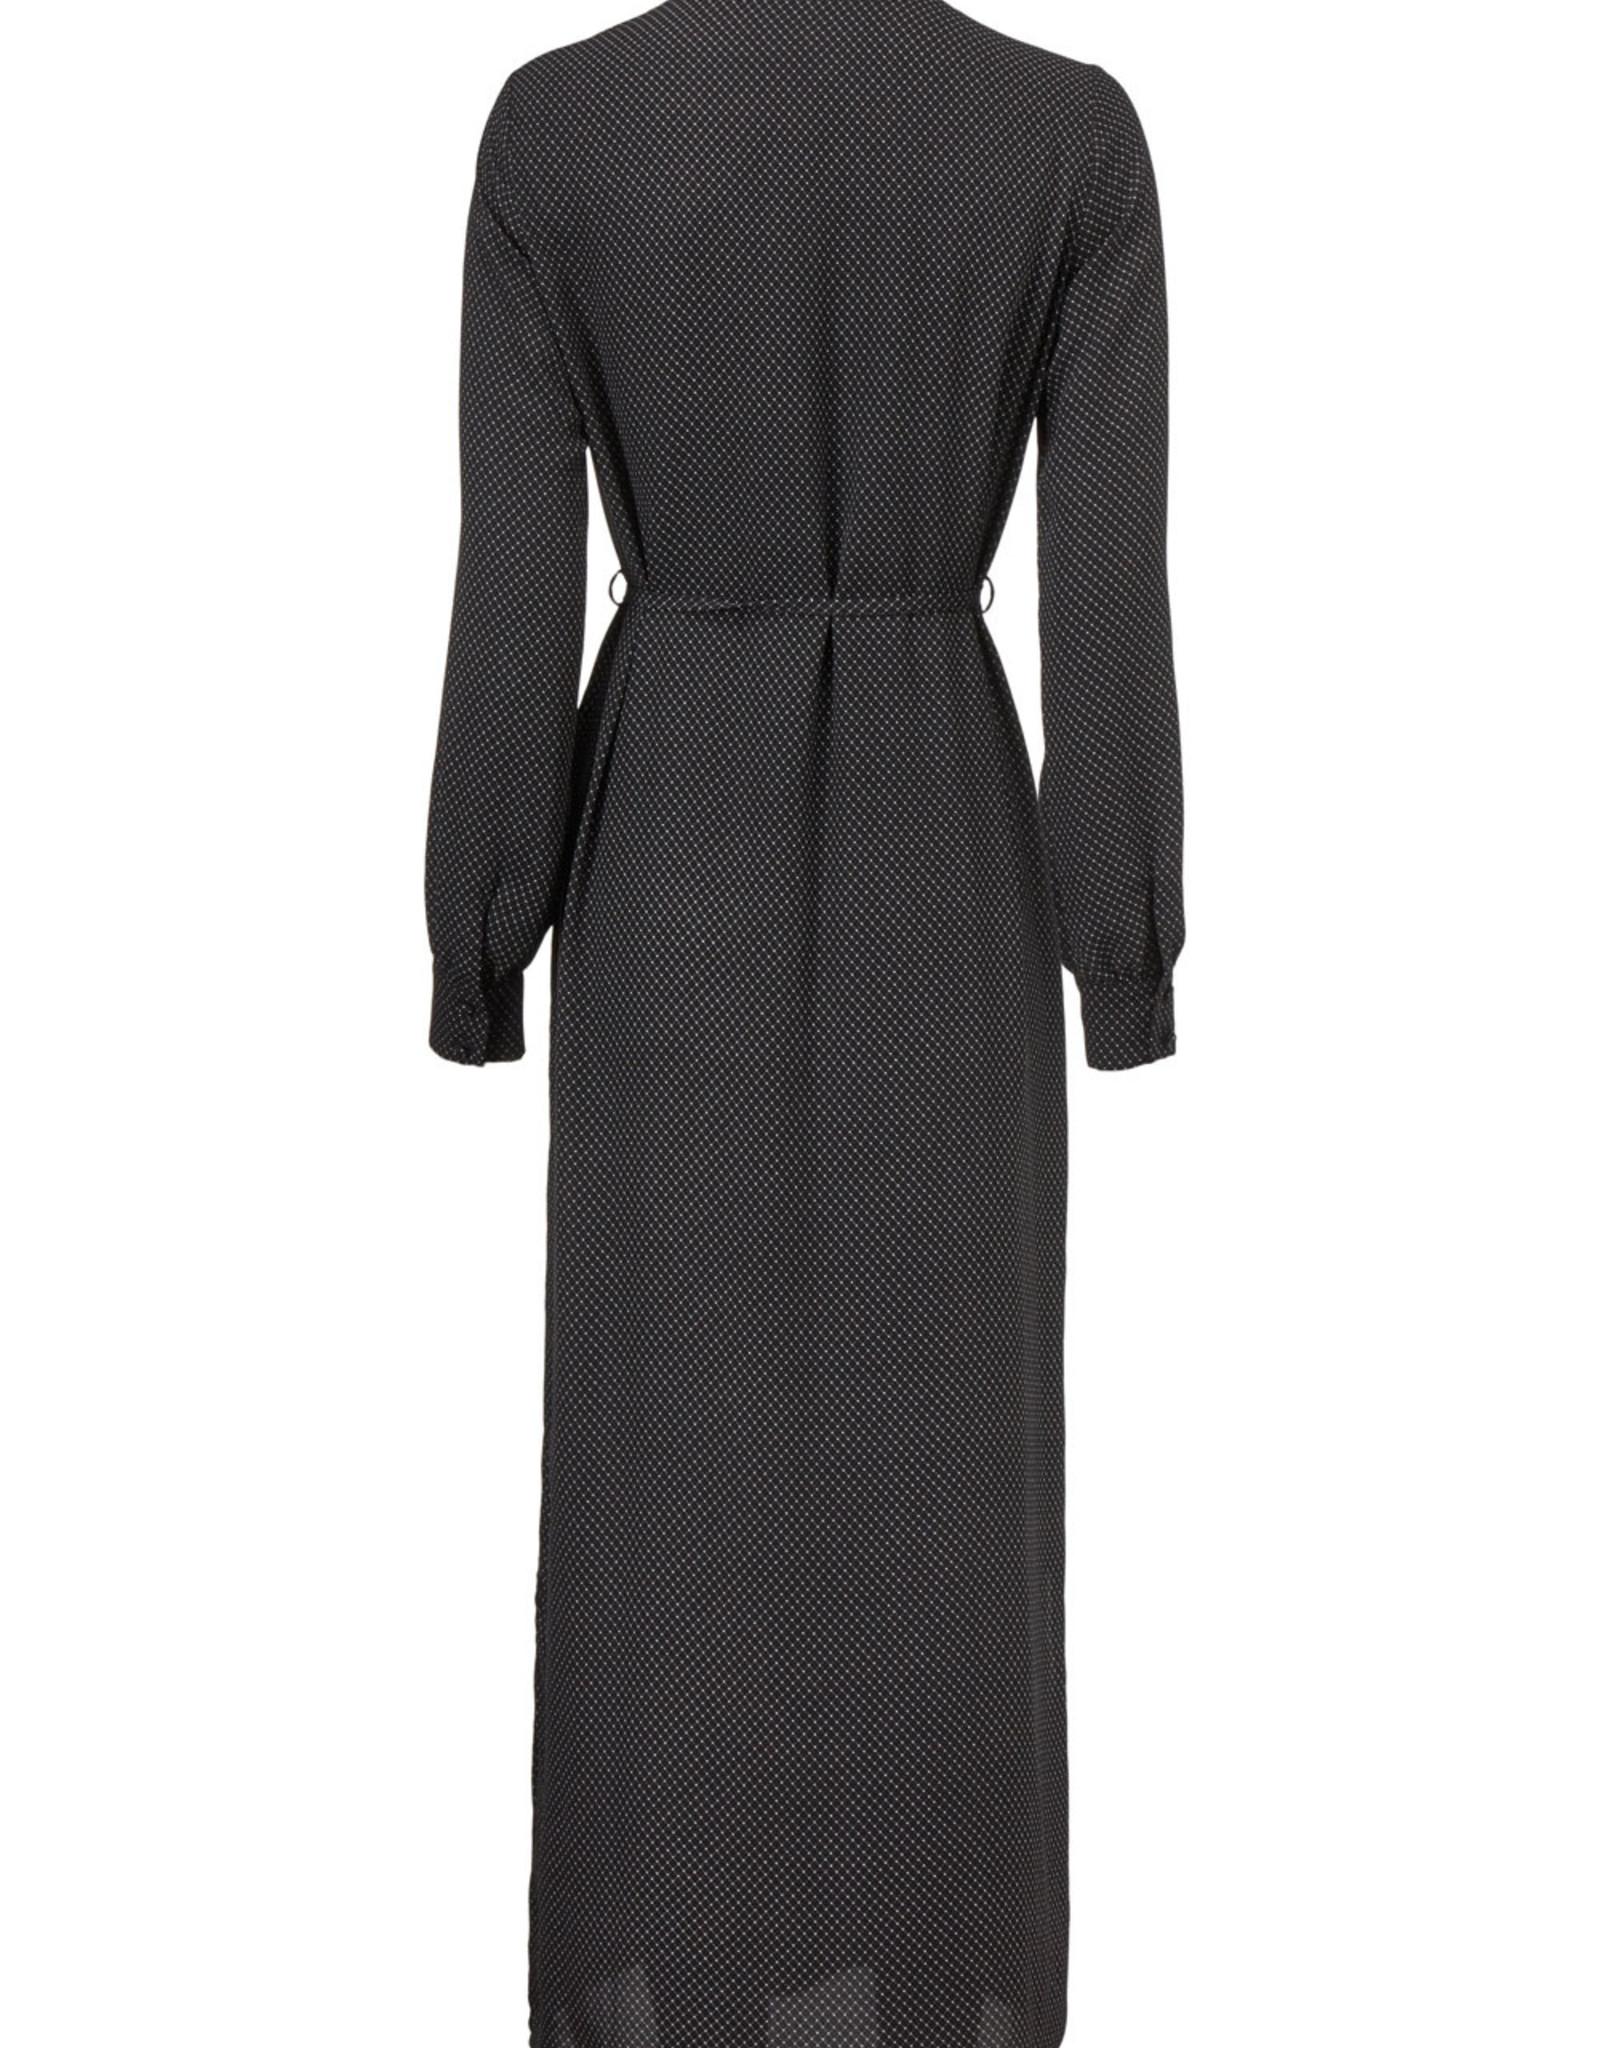 Modstrom Edna Print Dress